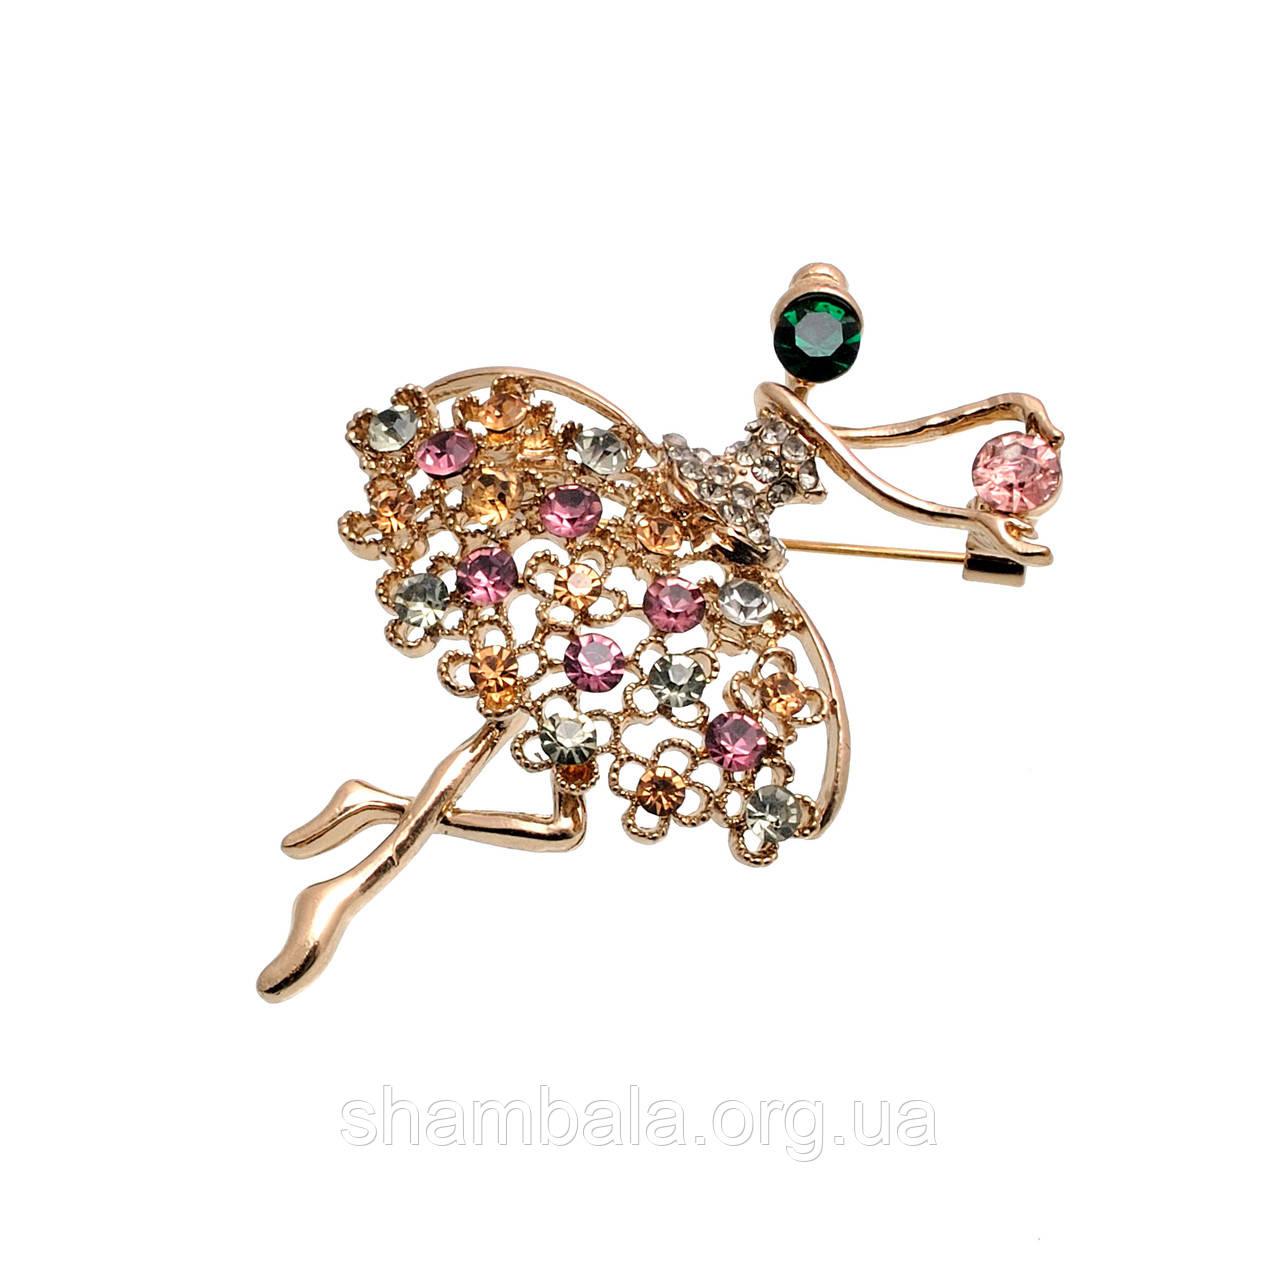 "Брошь Fashion Jewerly ""Балерина с разноцветными камнями"" (052007)"